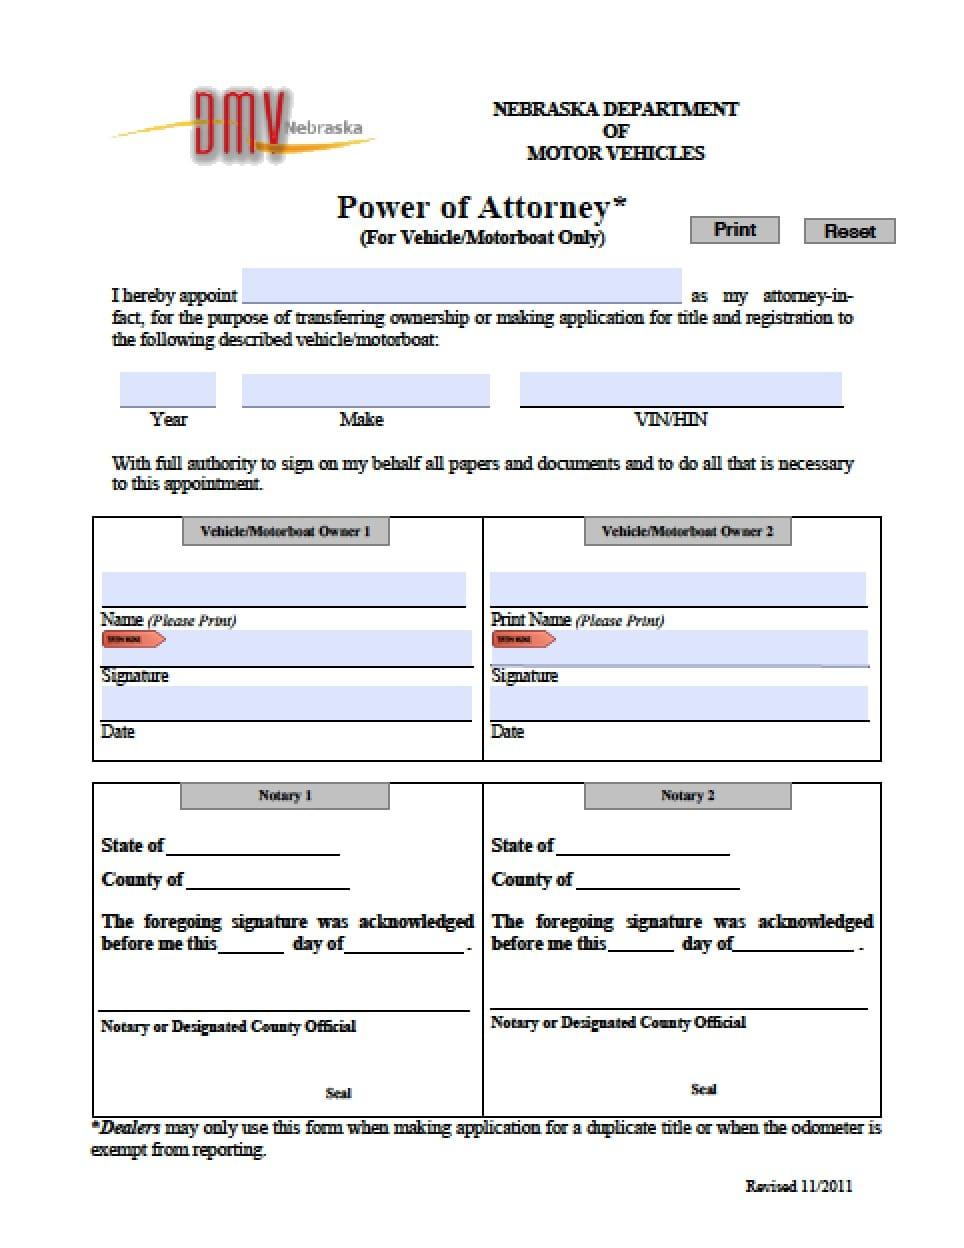 Nebraska Vehicle Power of Attorney Form - Power of Attorney ...